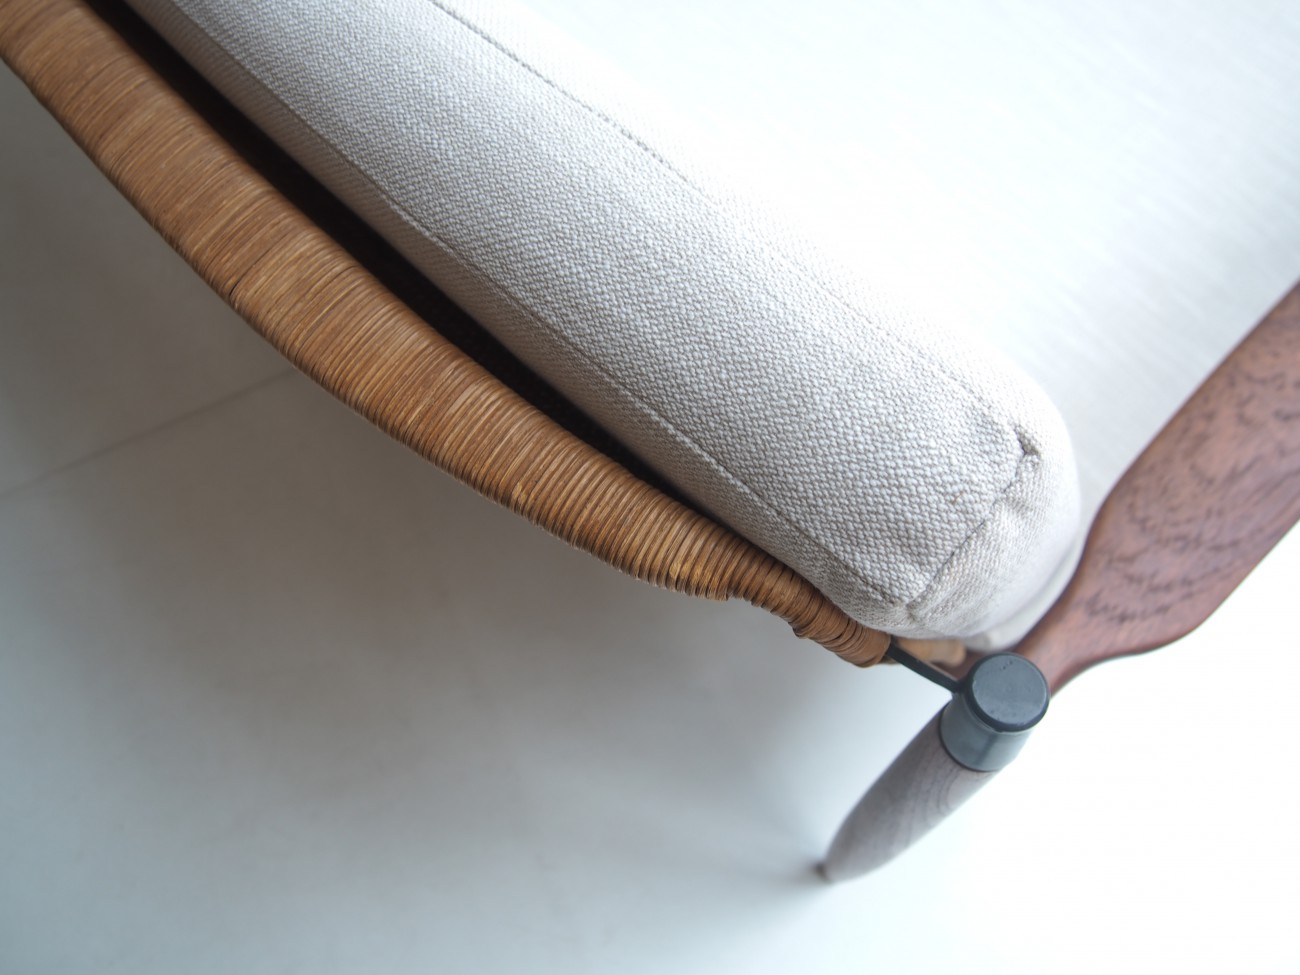 50~60's GOLDFEDER Sofa by CARL STRAUB from Germany / ビンテージ ヨーロッパ・ドイツ家具 3人掛けソファ(3シーター)